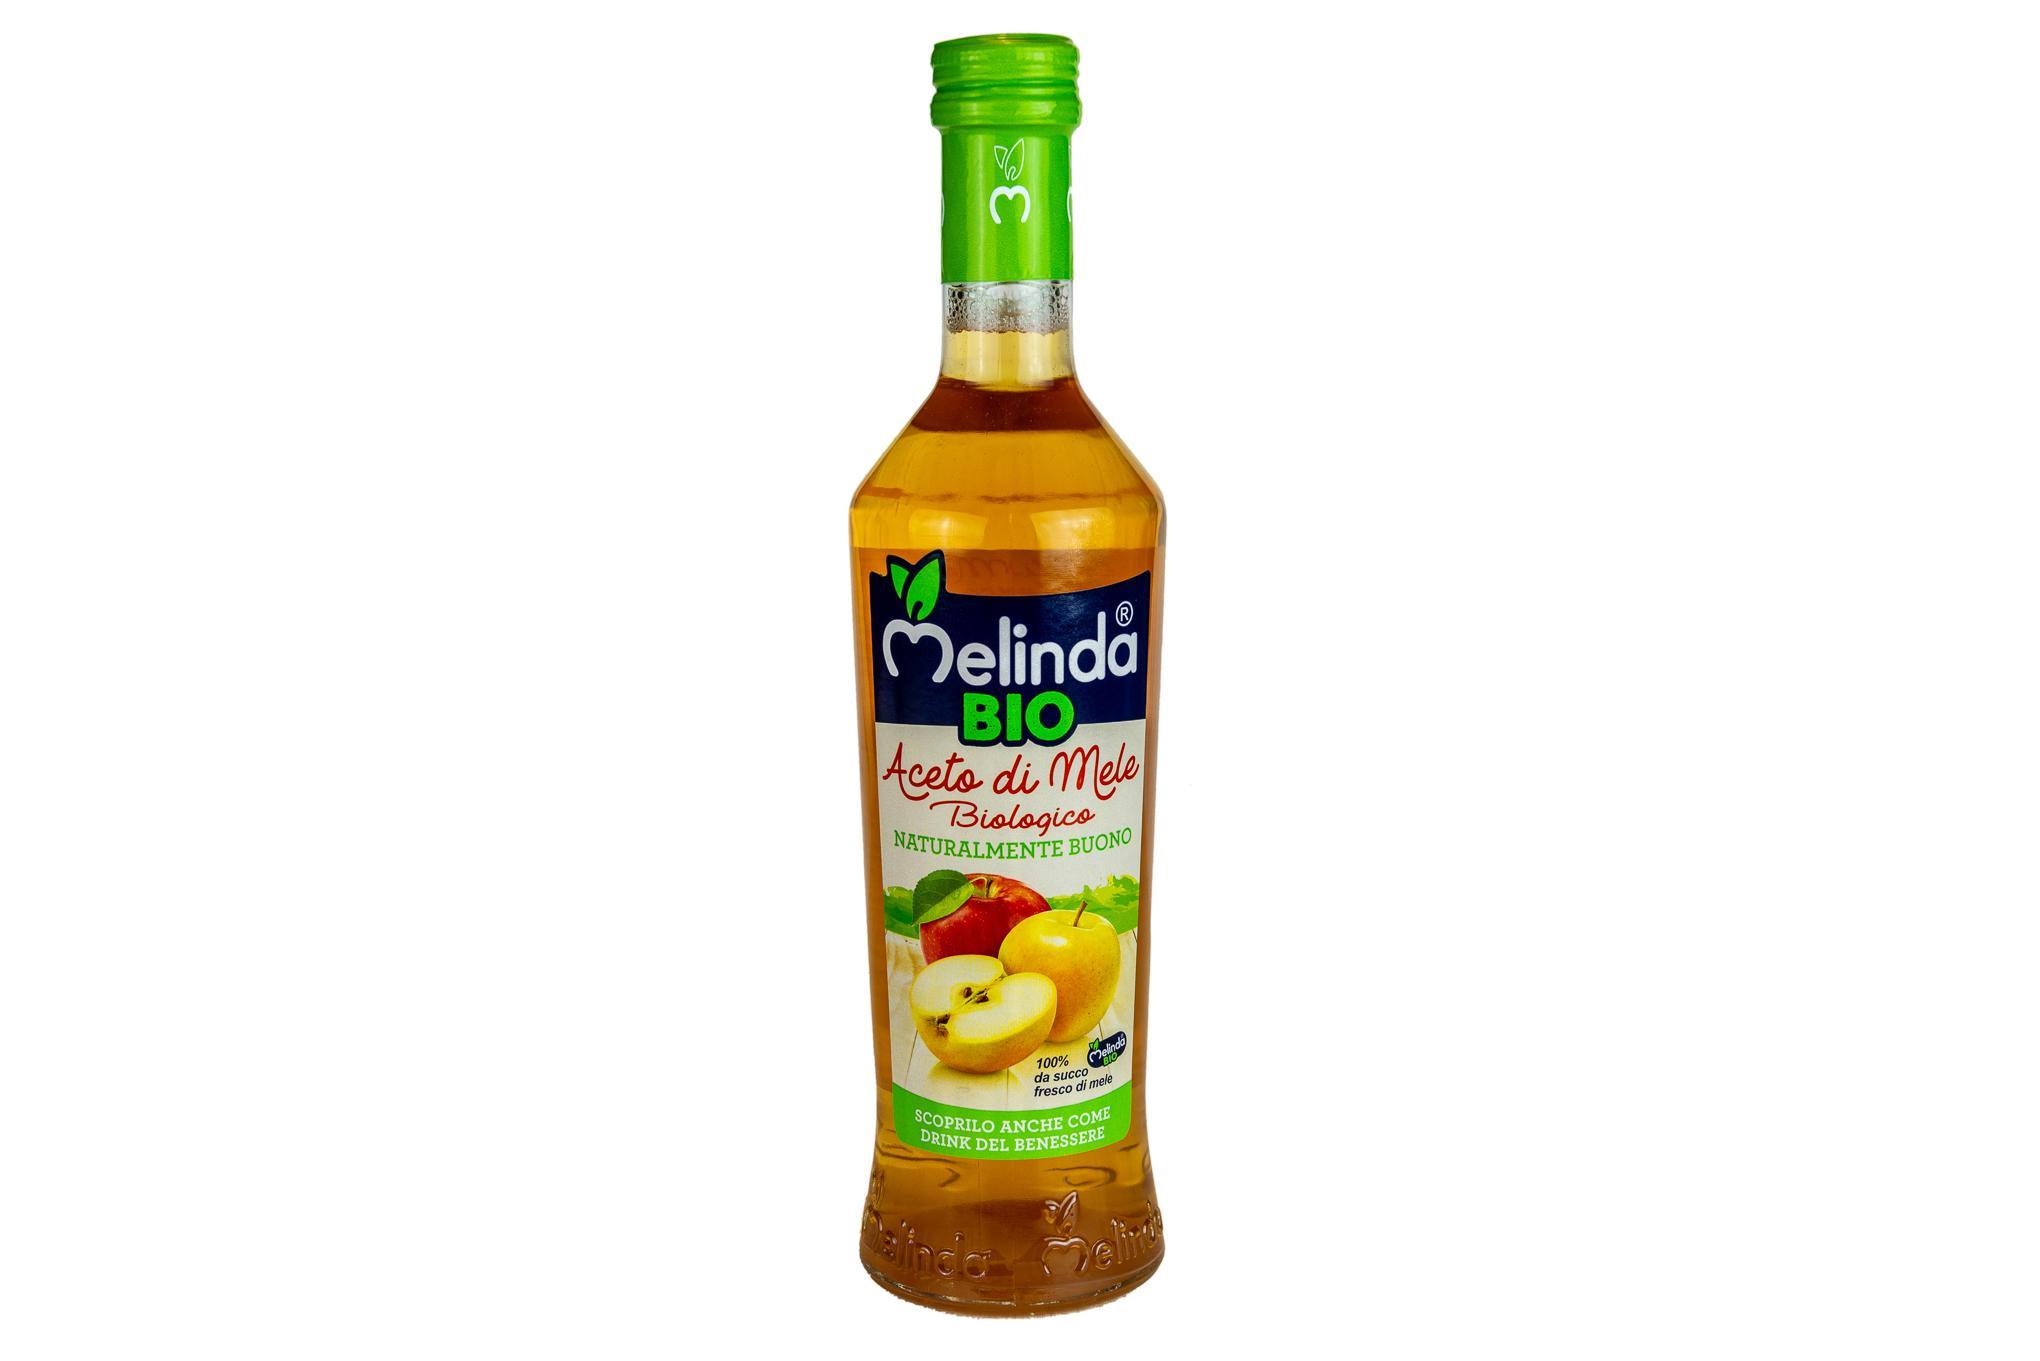 Aceto di Mele Biologico Melinda (500ml)